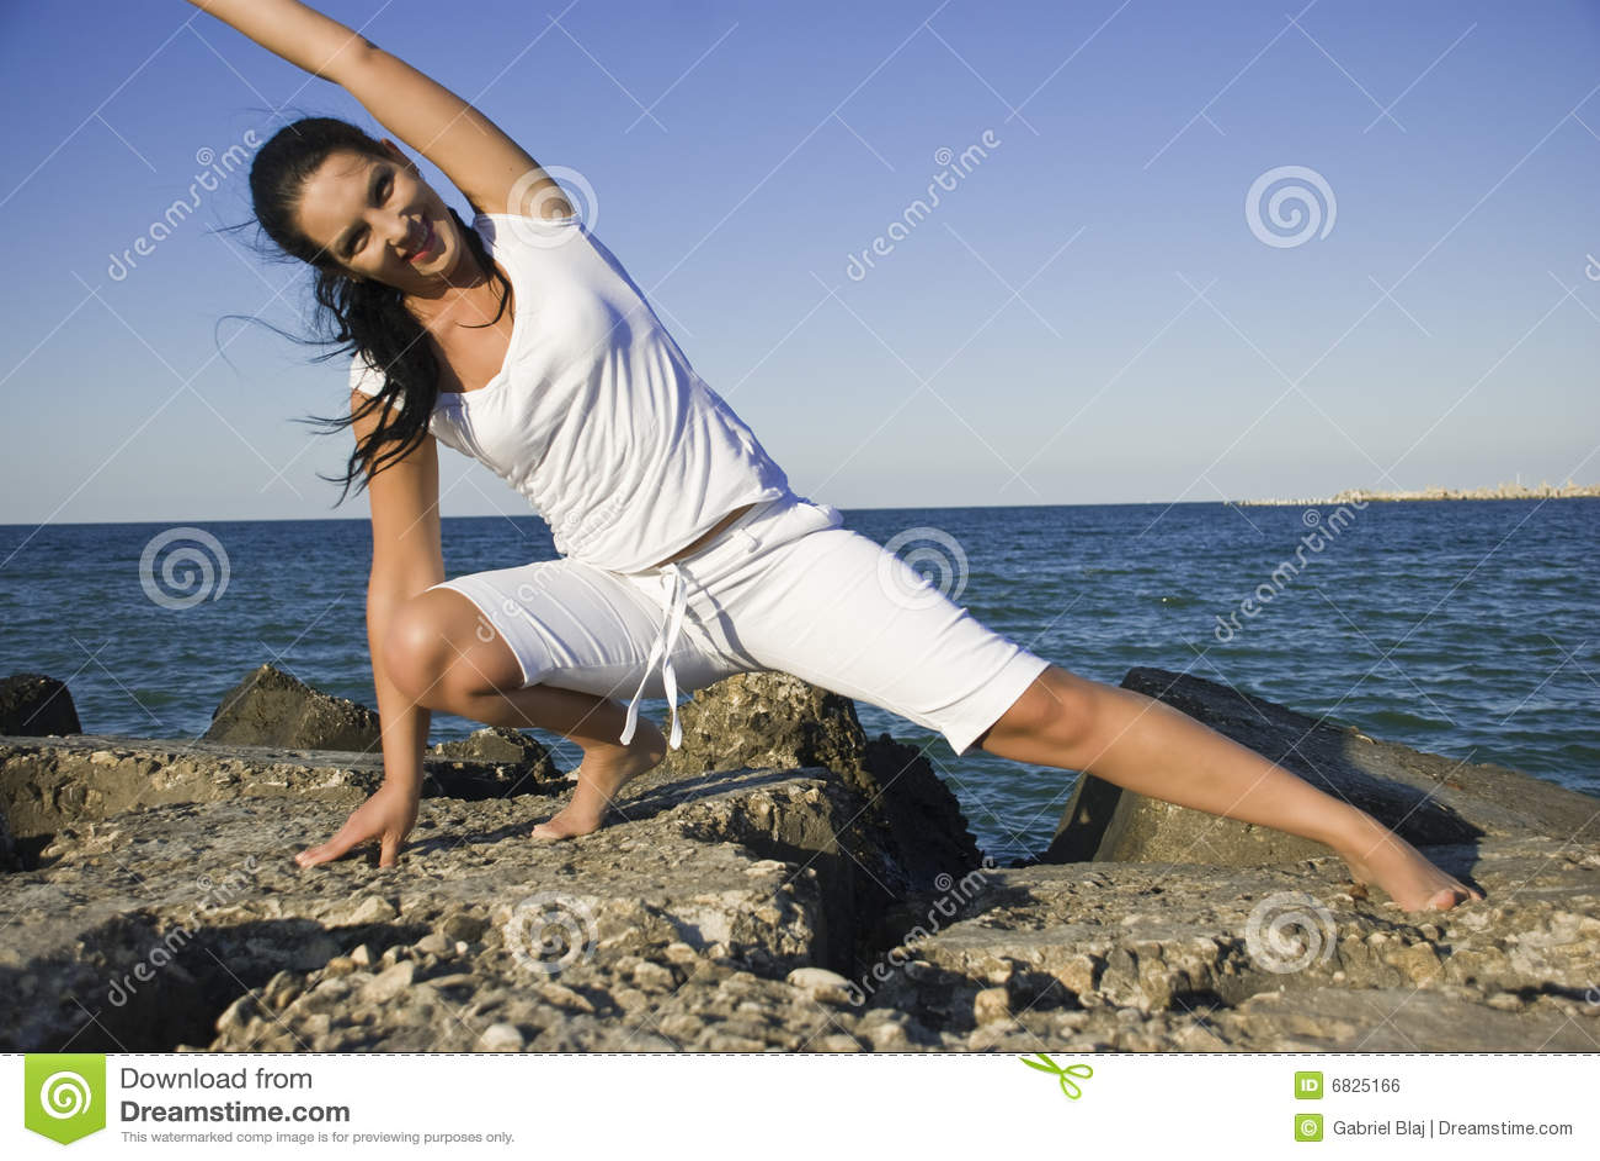 Gym on rocks at sea